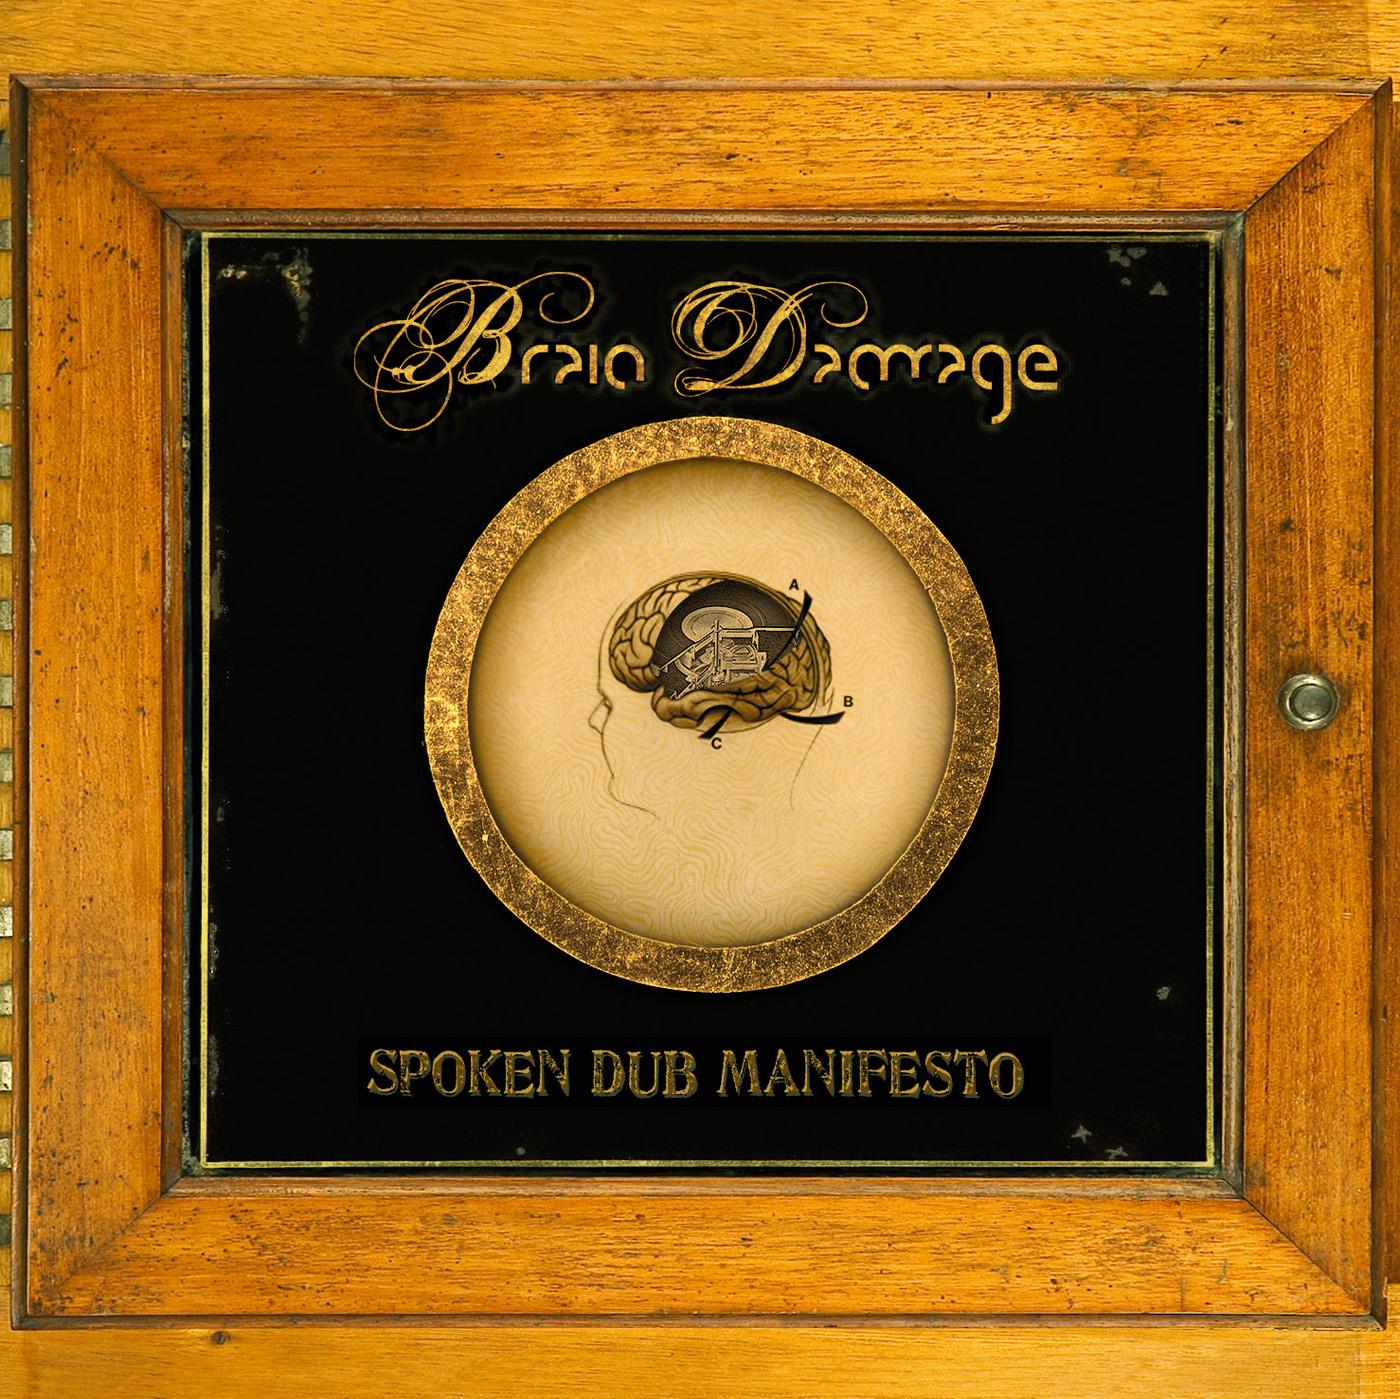 Spoken dub manifesto vol.1